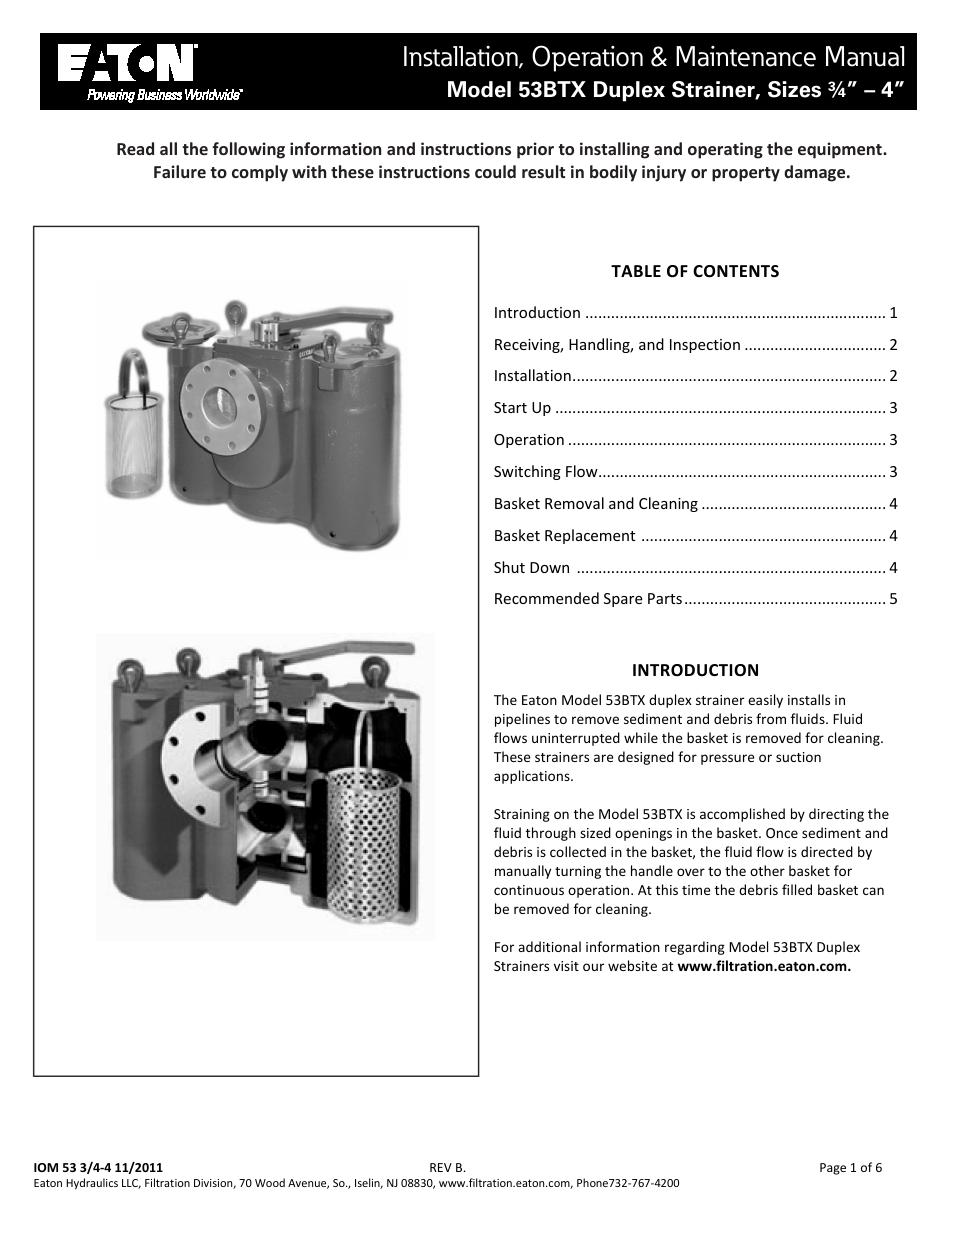 Viking Pump TSM641 1: Eaton Mod 53BTX Duplex Strainer User Manual